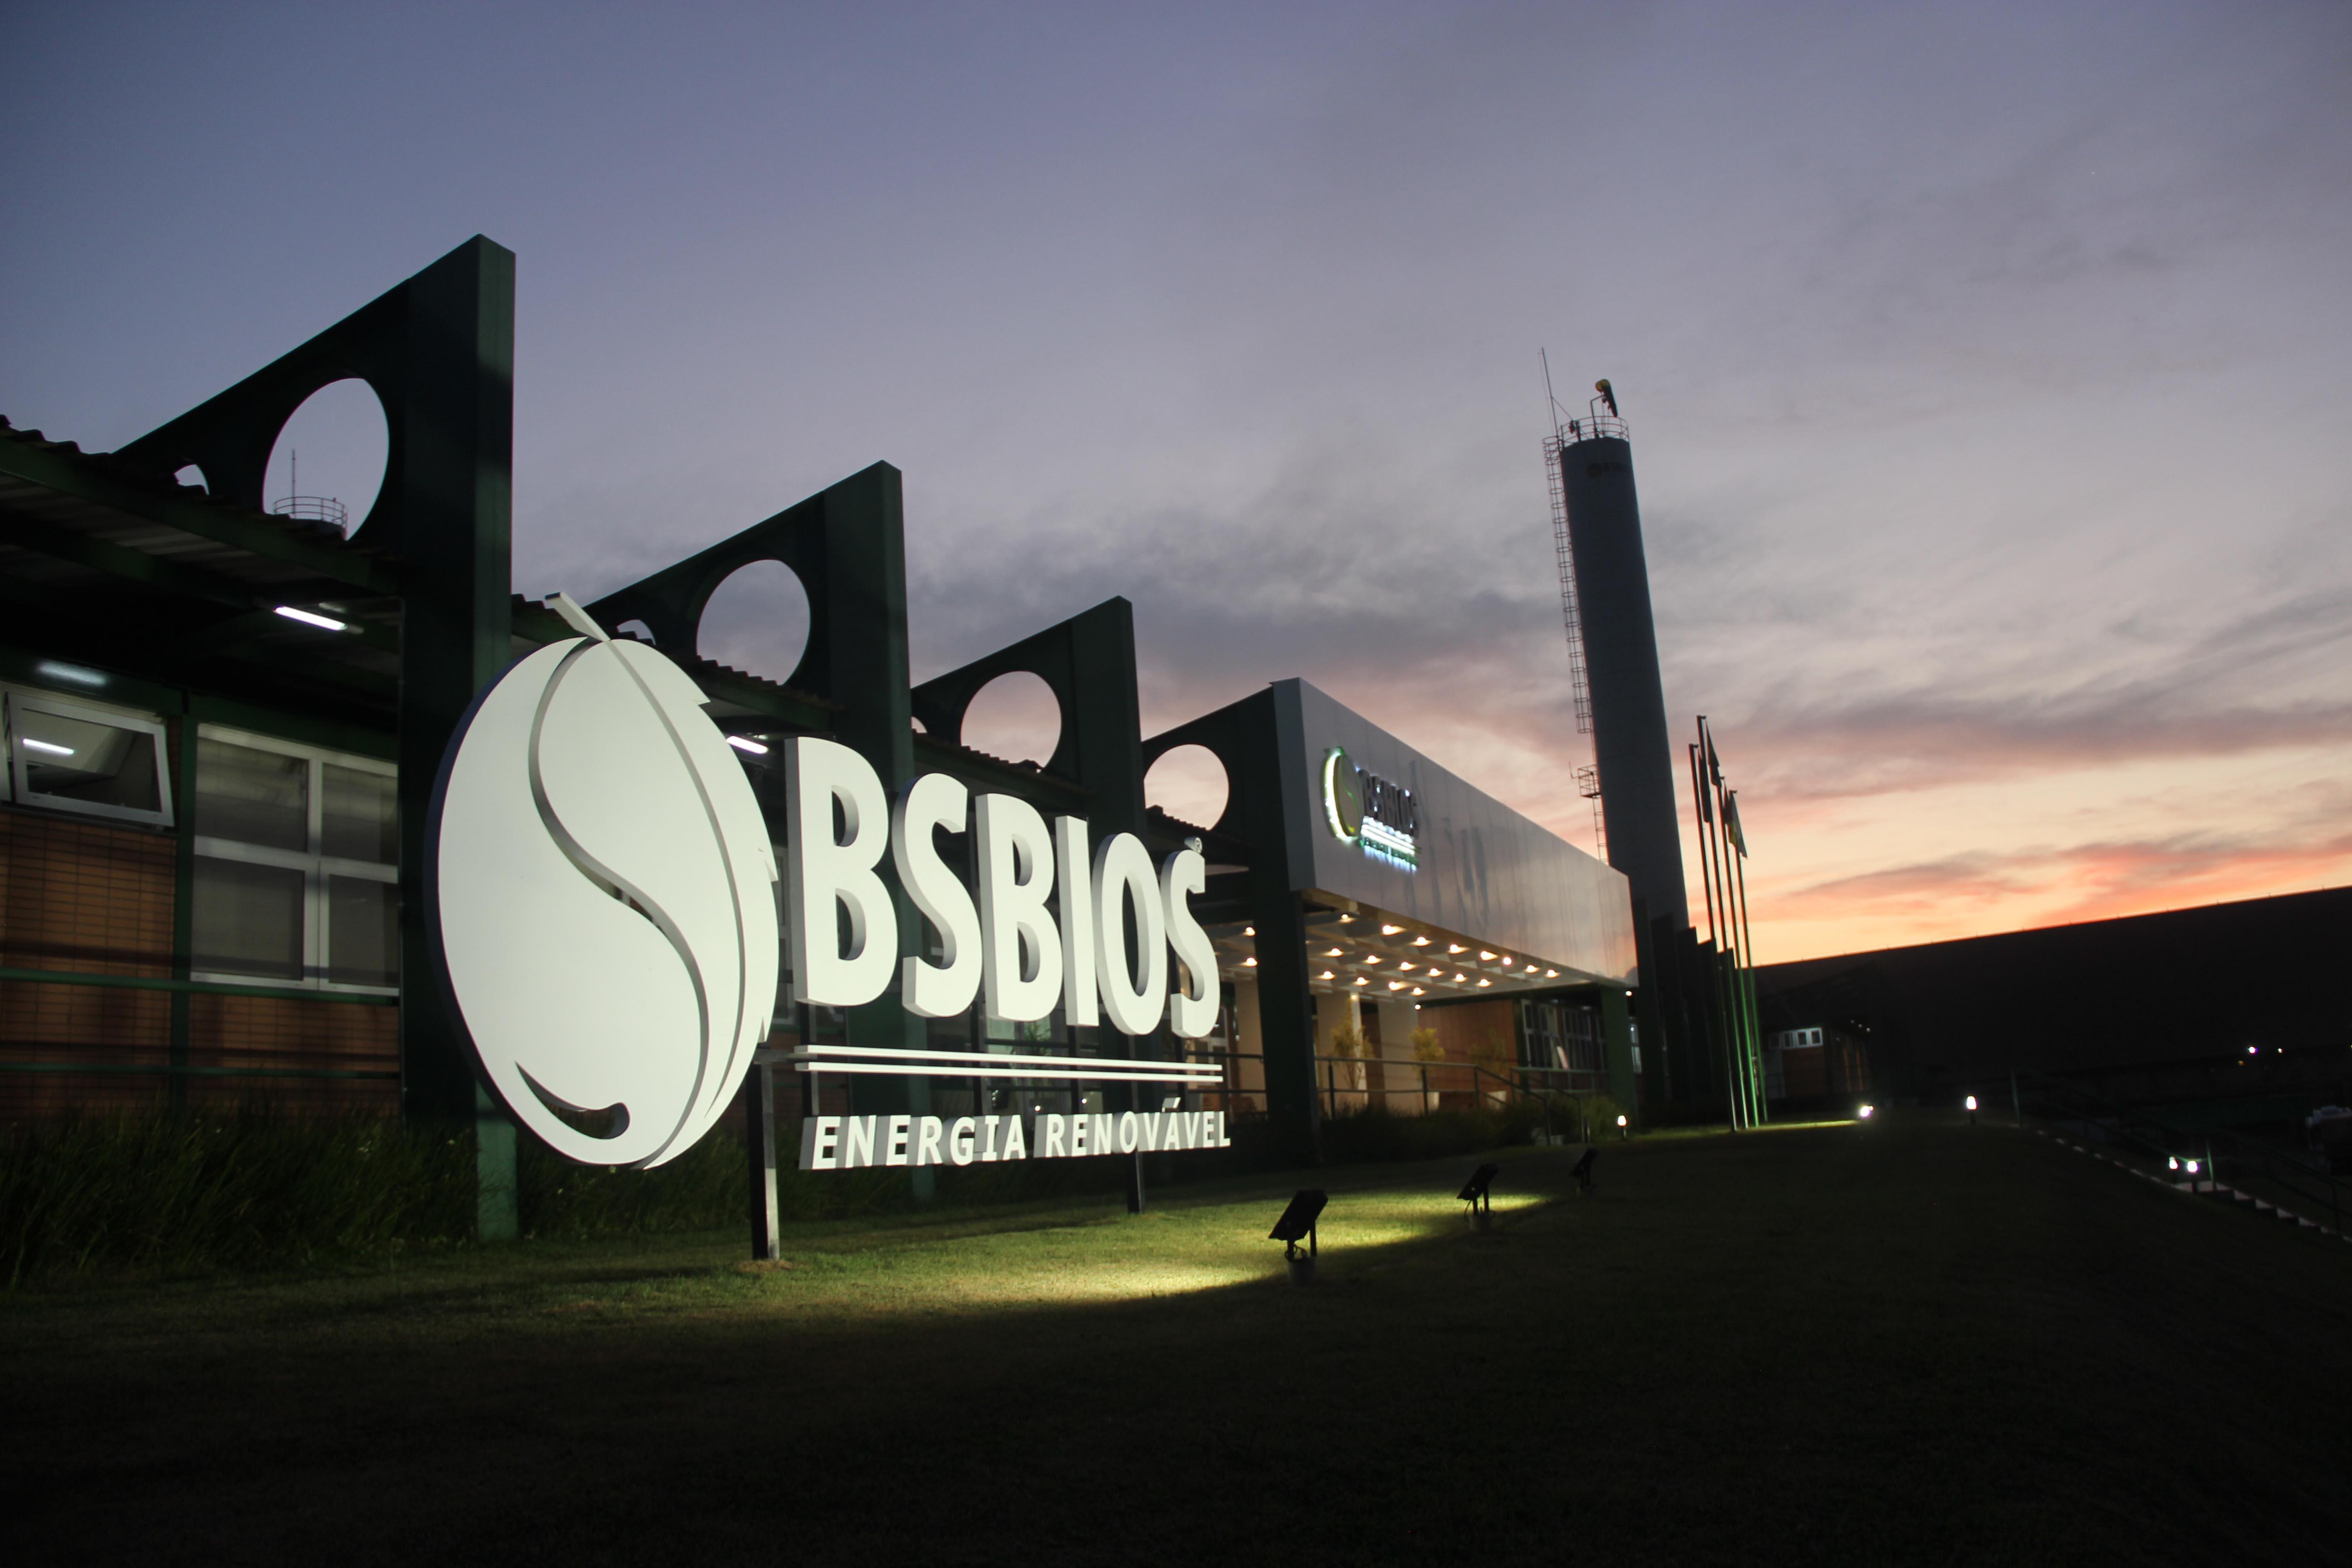 BSBIOS define base na Suíça como plataforma para desenvolver negócios na Europa